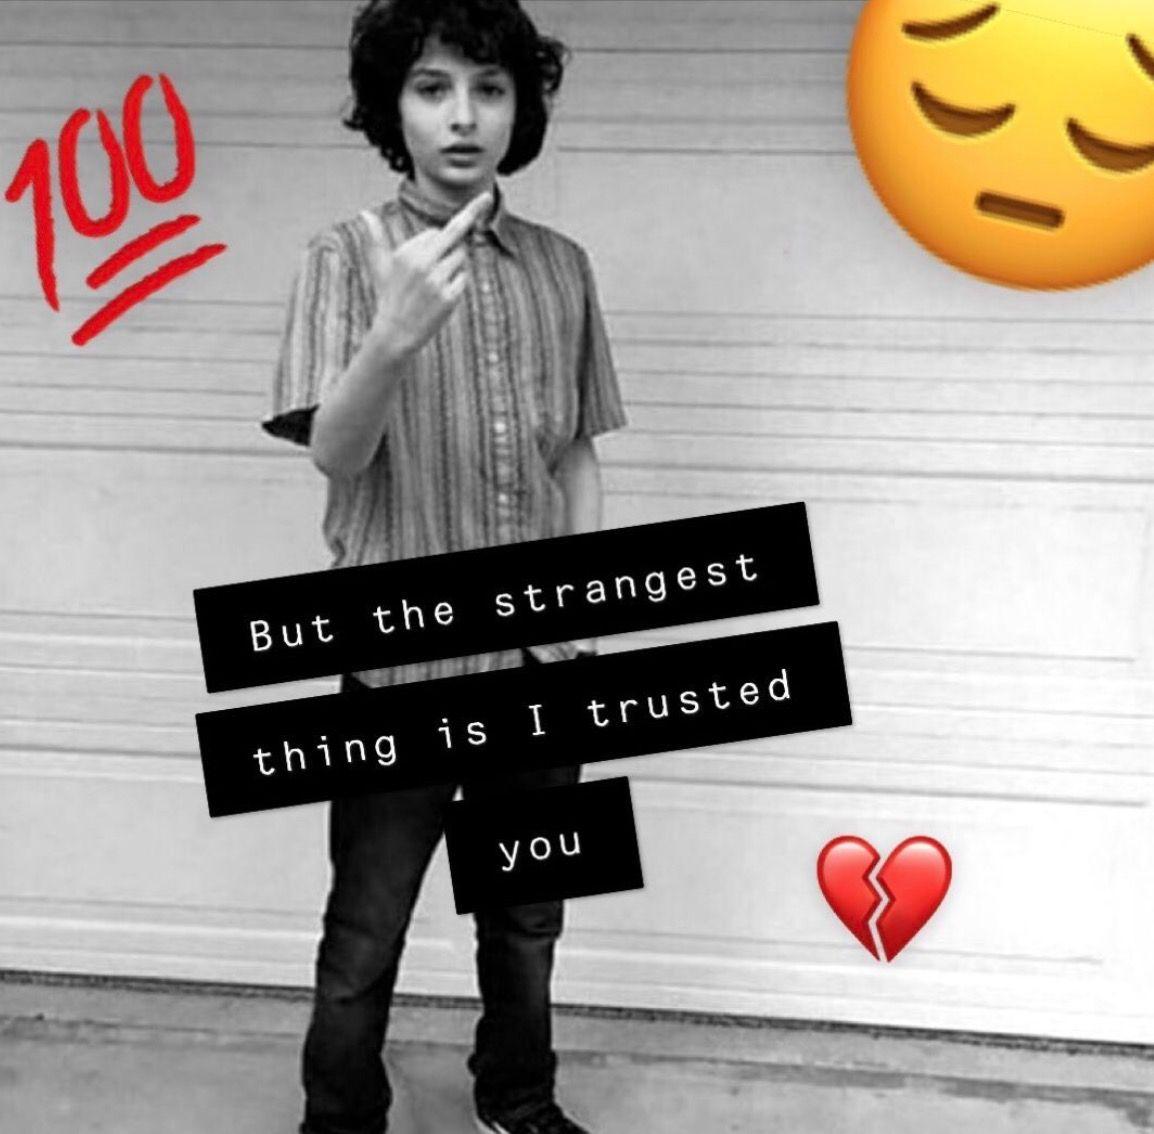 Pin By Andrea R On Twitter Memes Lol Really Funny Memes Stranger Things Season Popular Netflix Shows